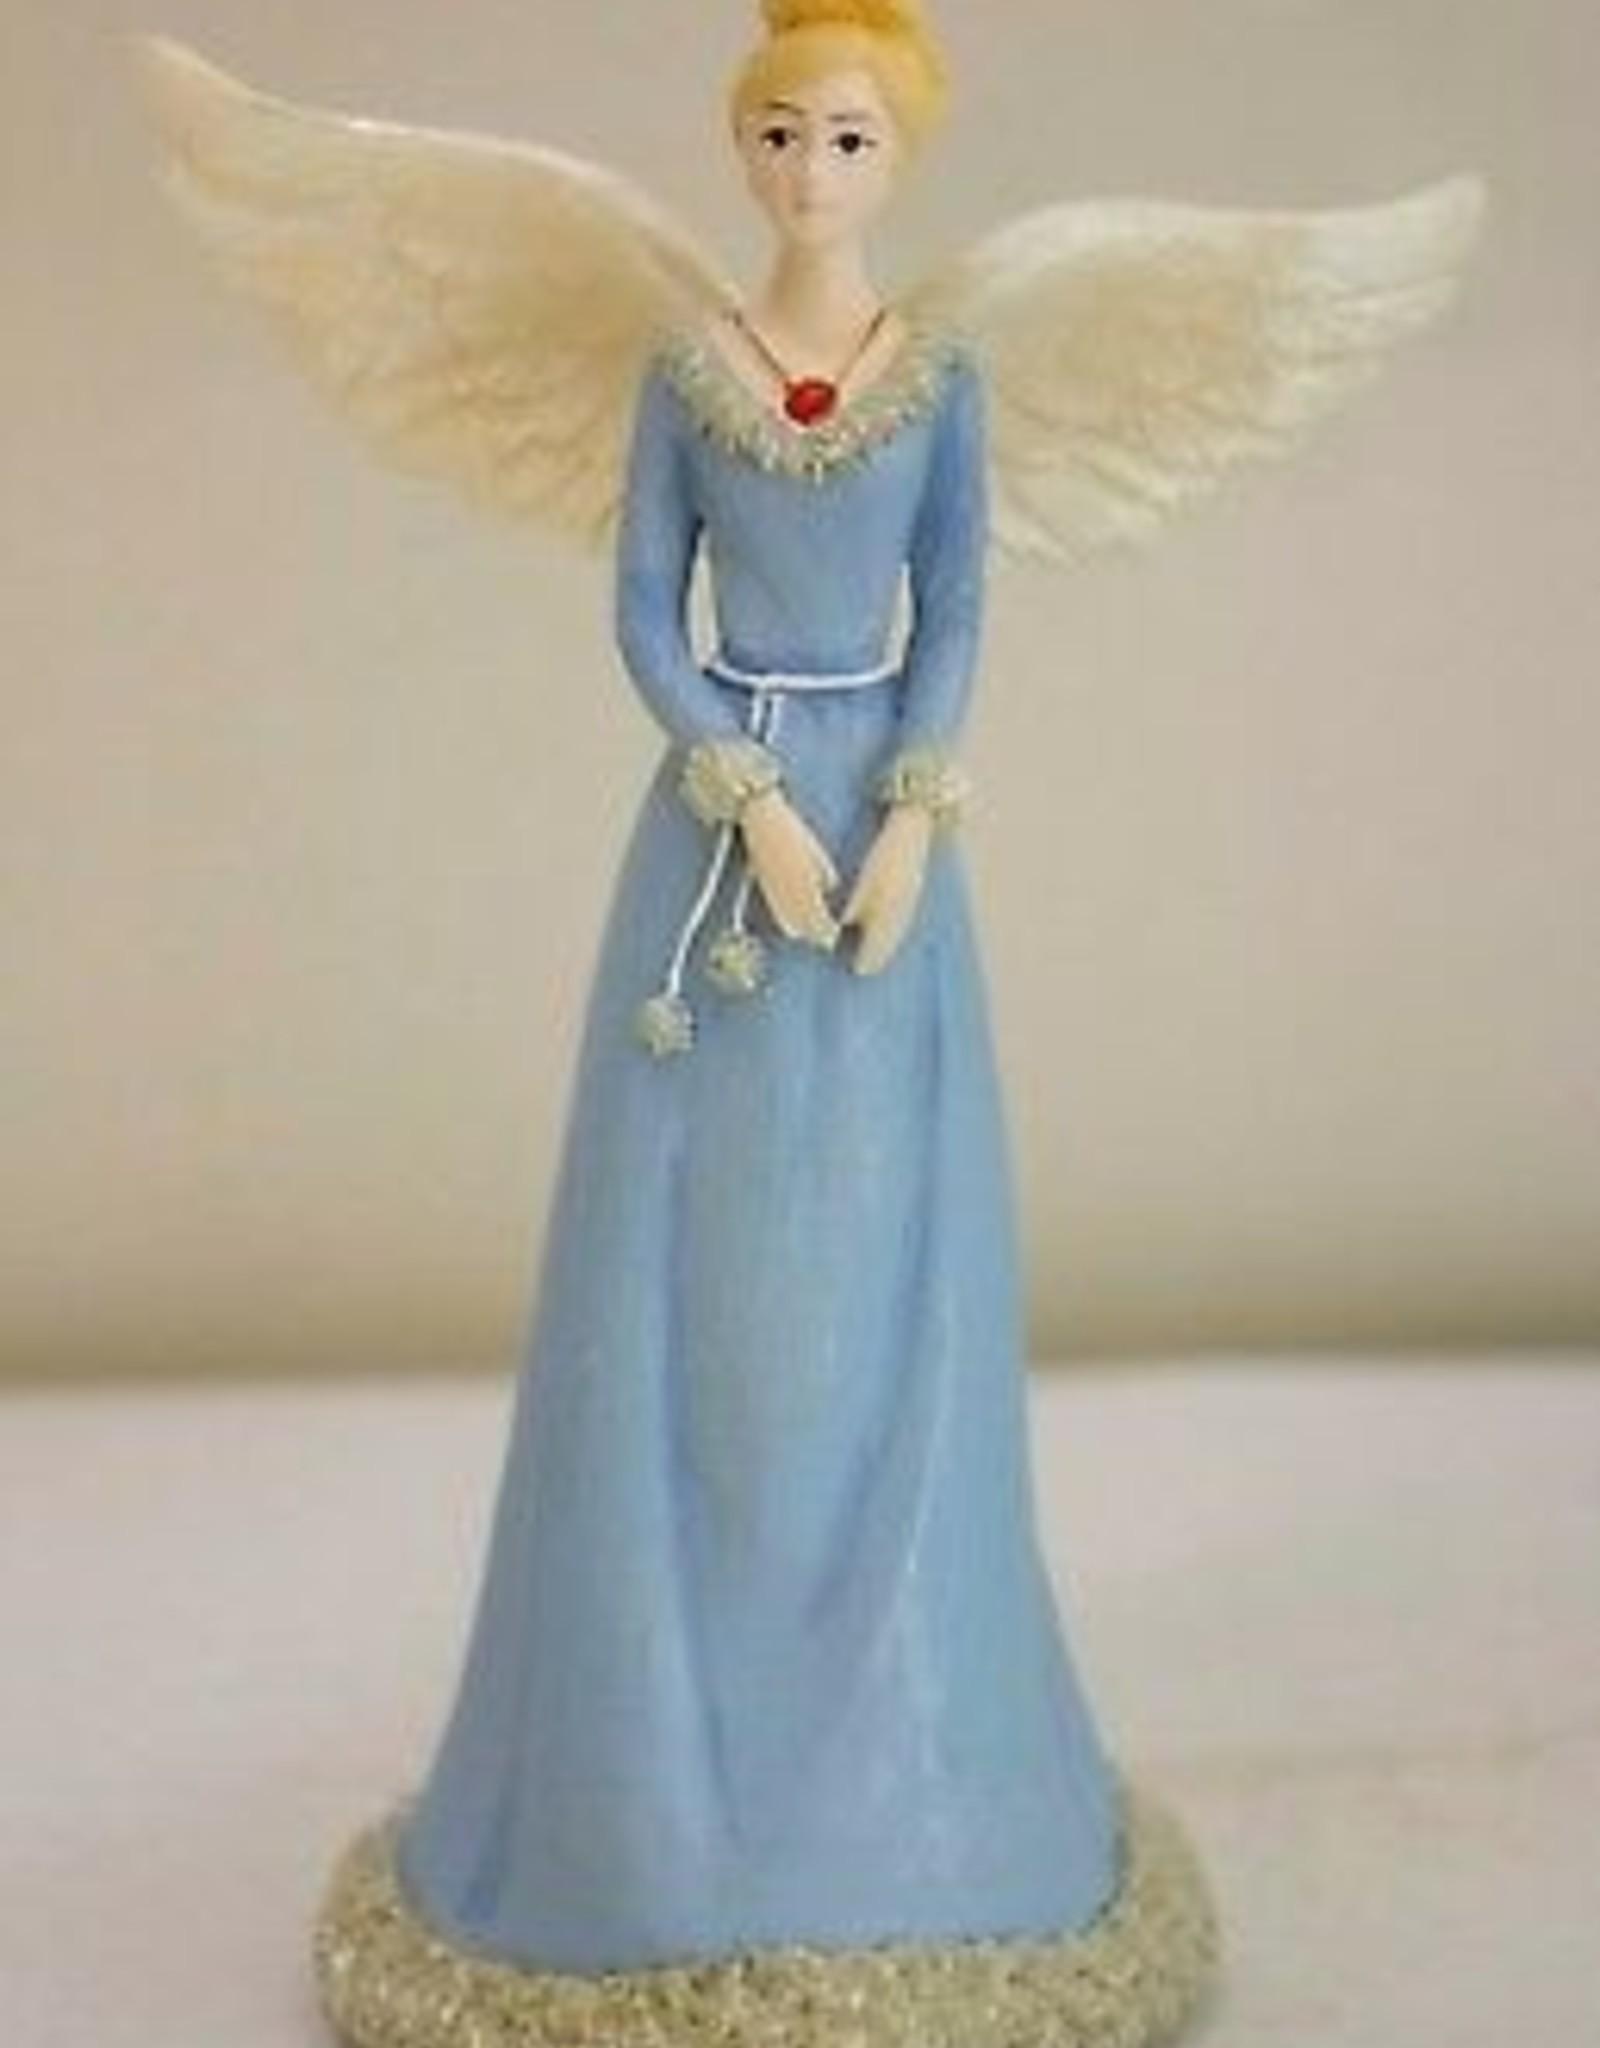 JANUARY ANGEL FIGURINE